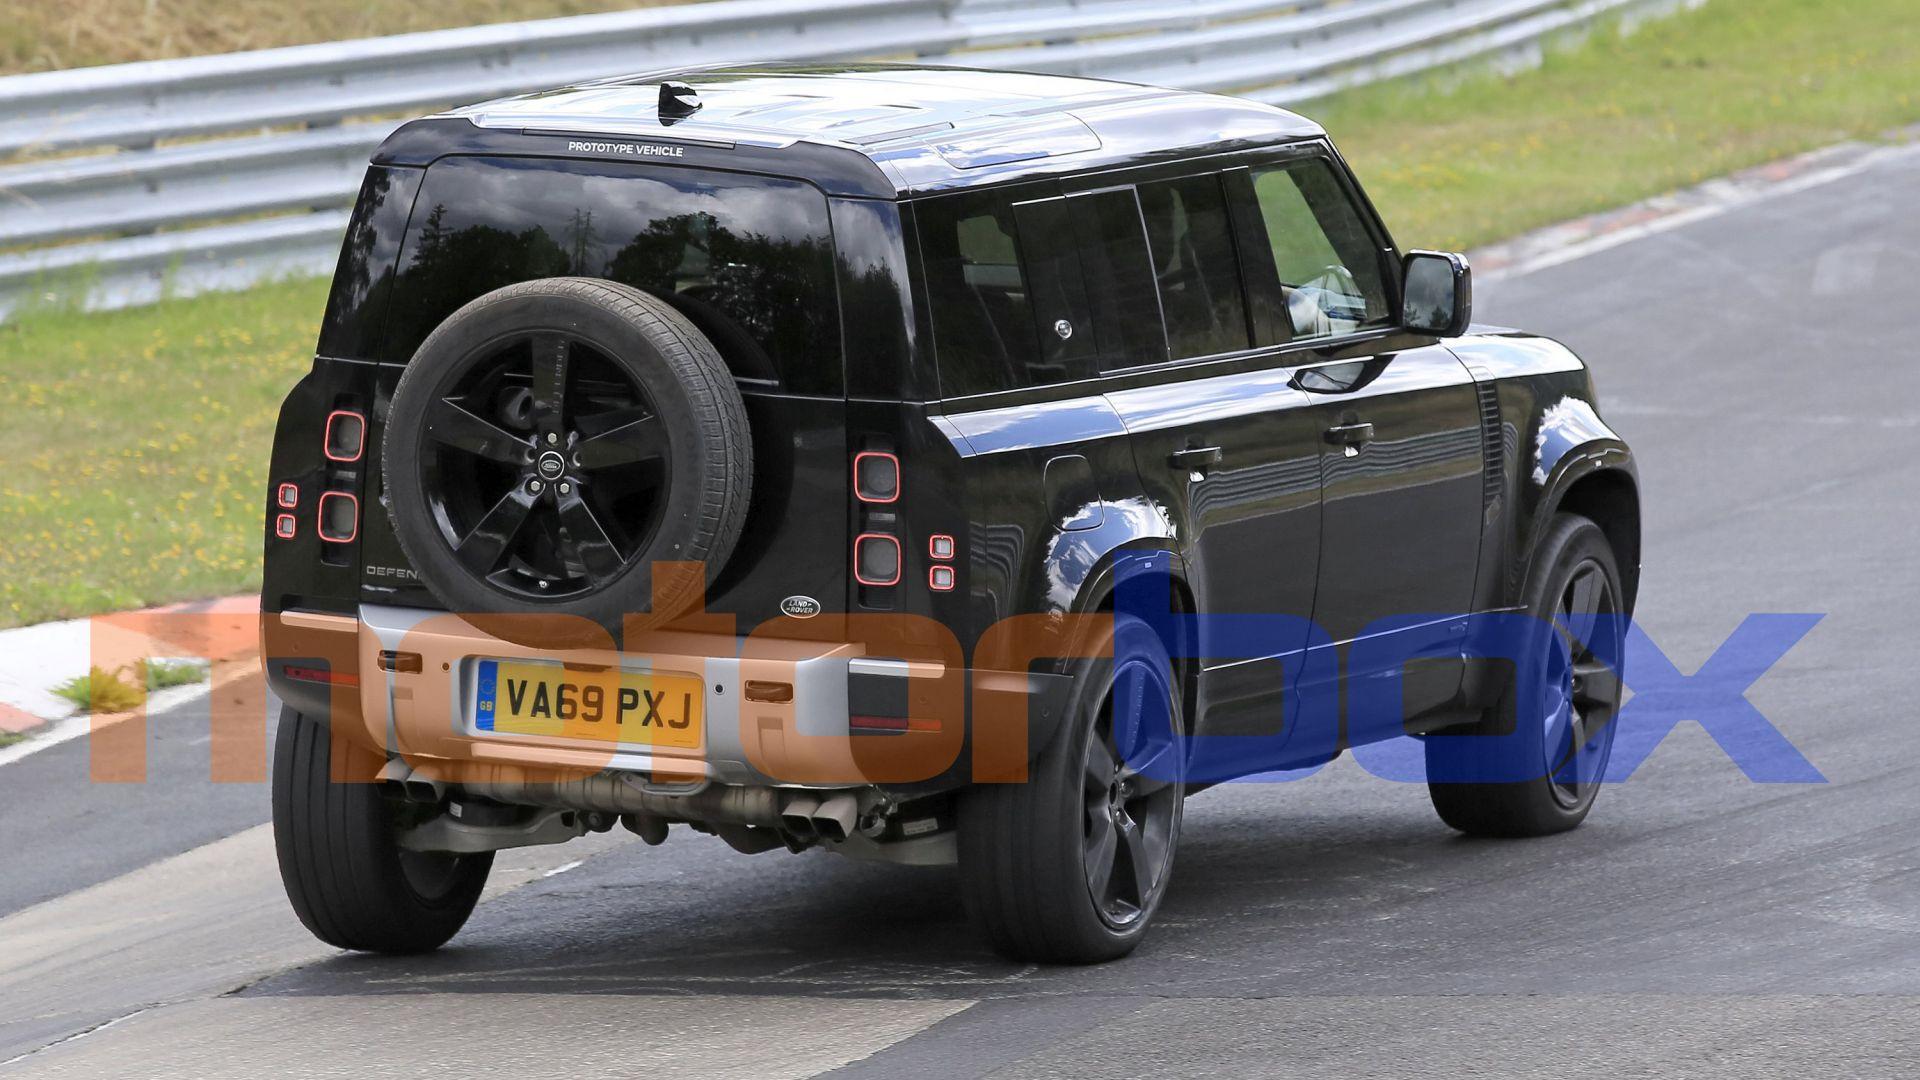 Nuova Land Rover Defender V8 2020: foto spia, motore ...